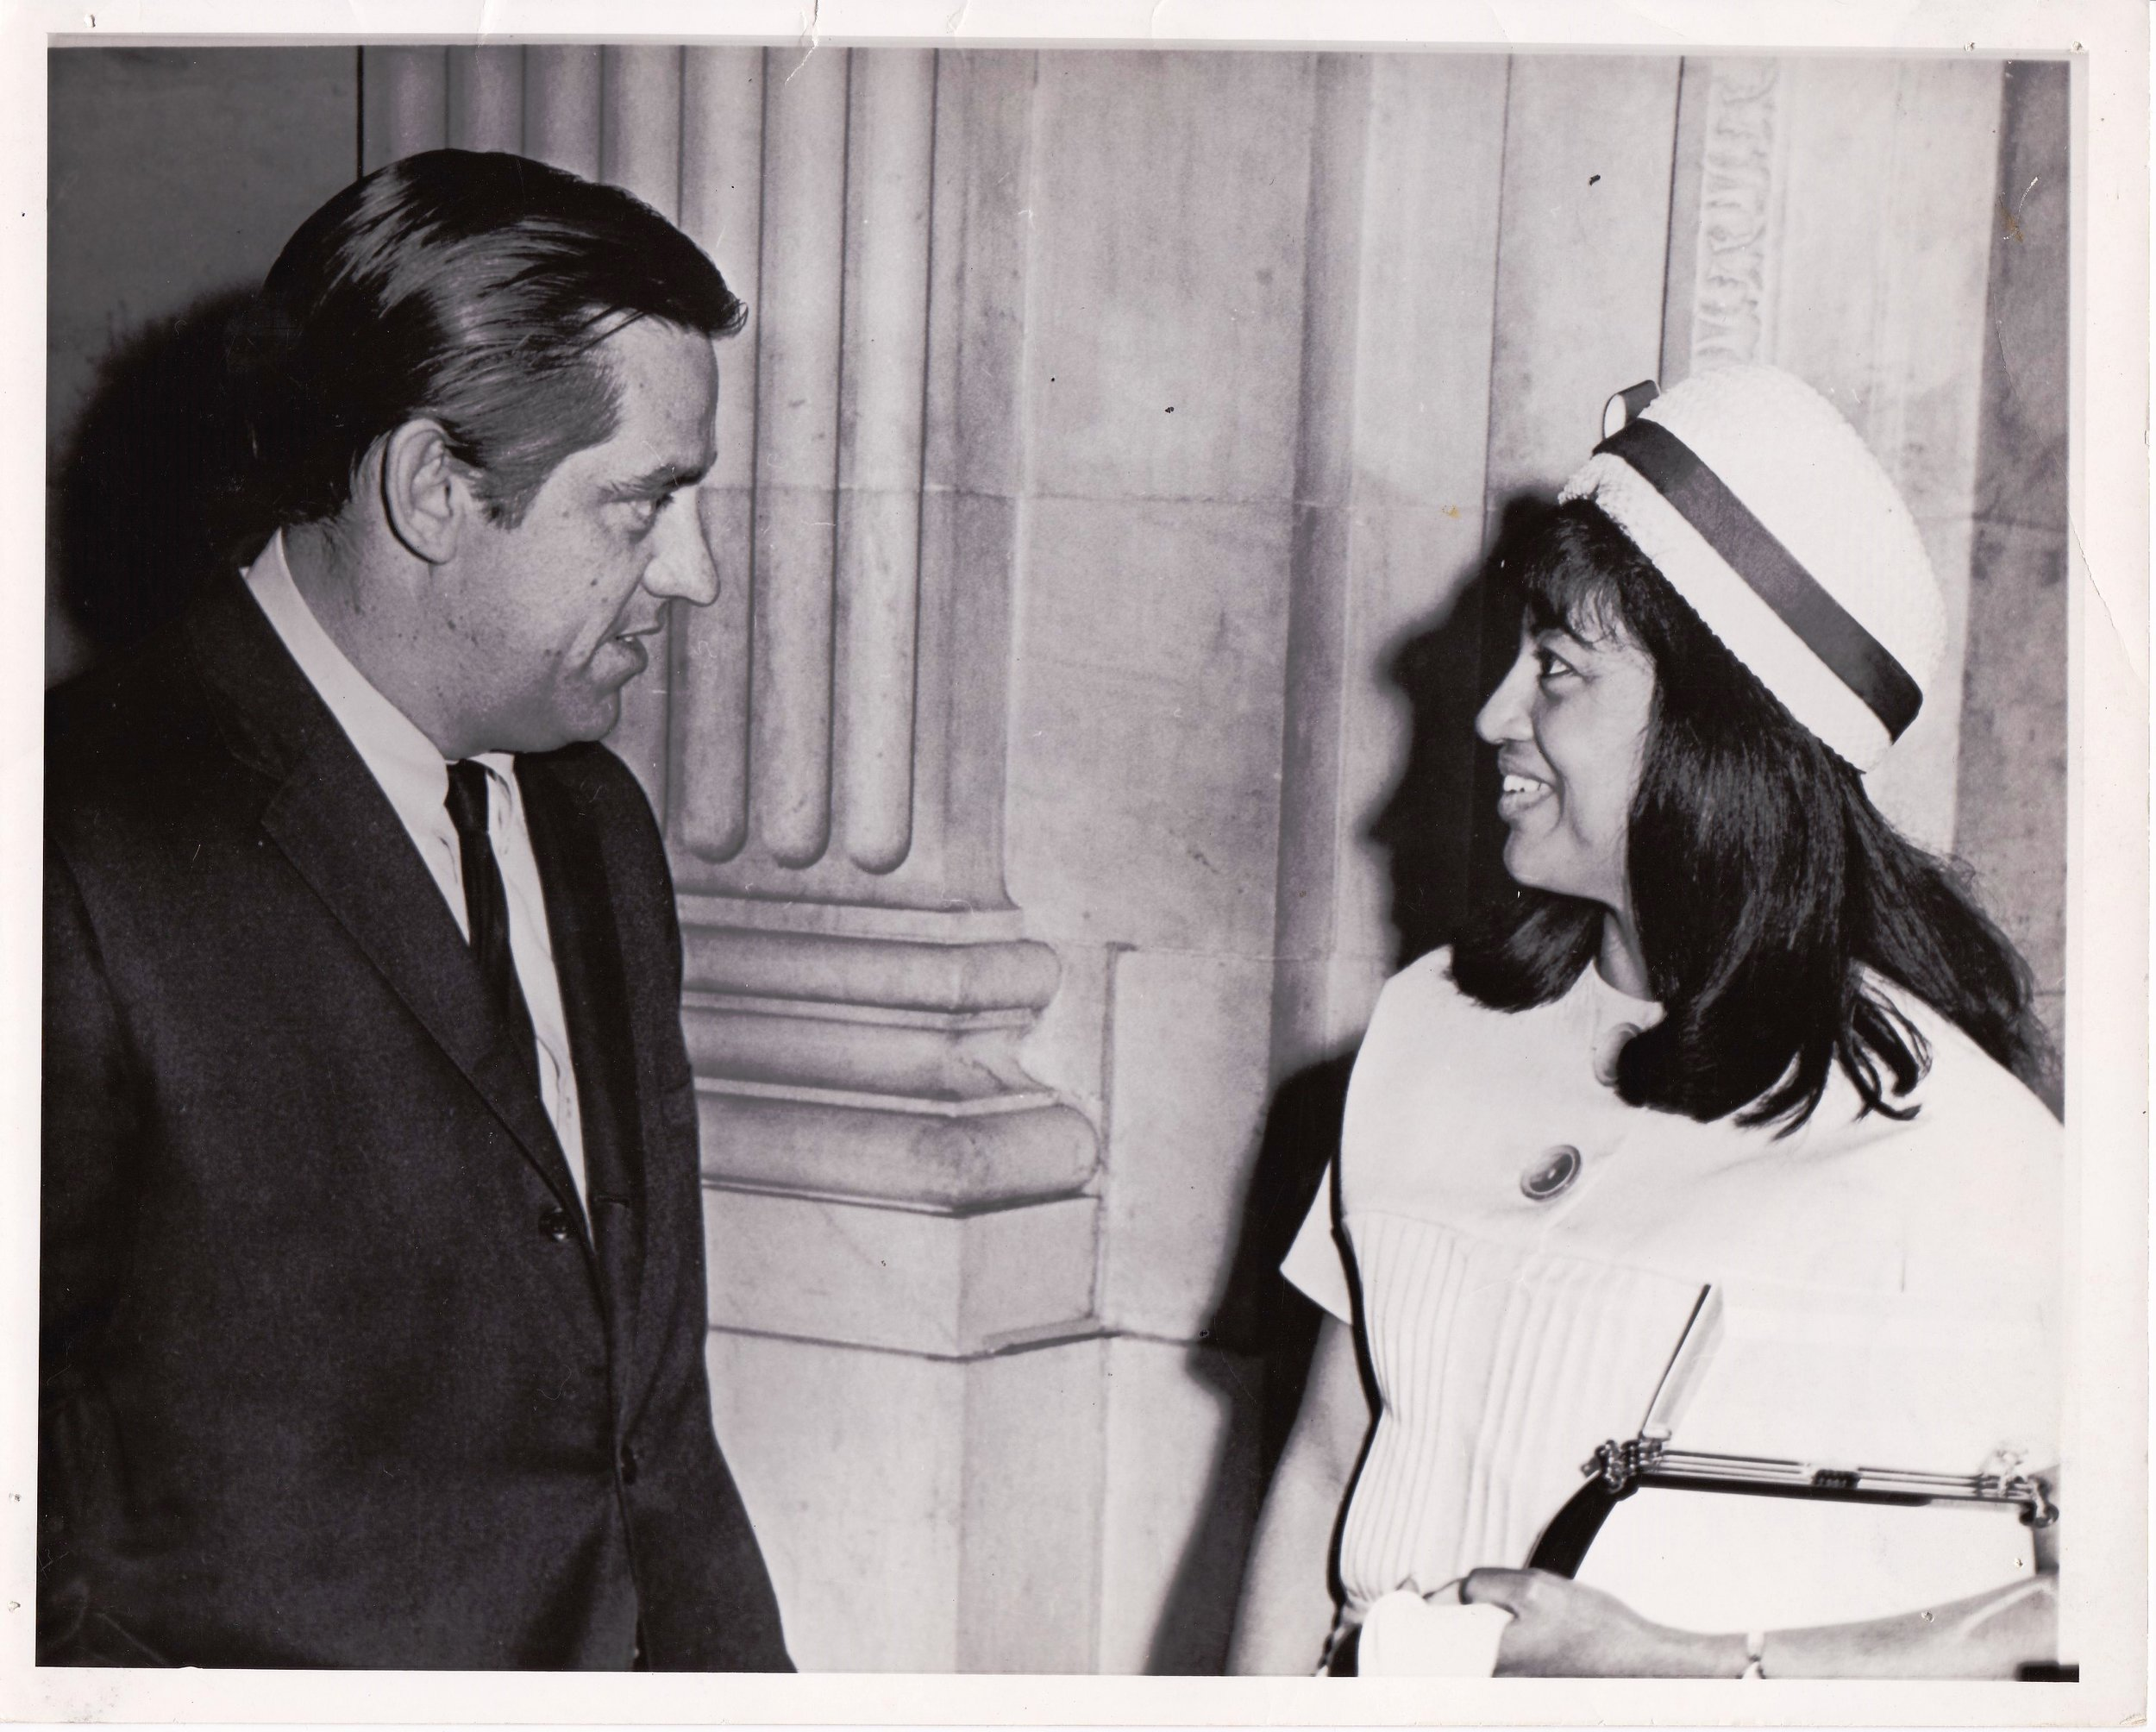 Senate Subcommittee Hearing in 1968, Senator Fred Harris and Myralin LaCabe '66